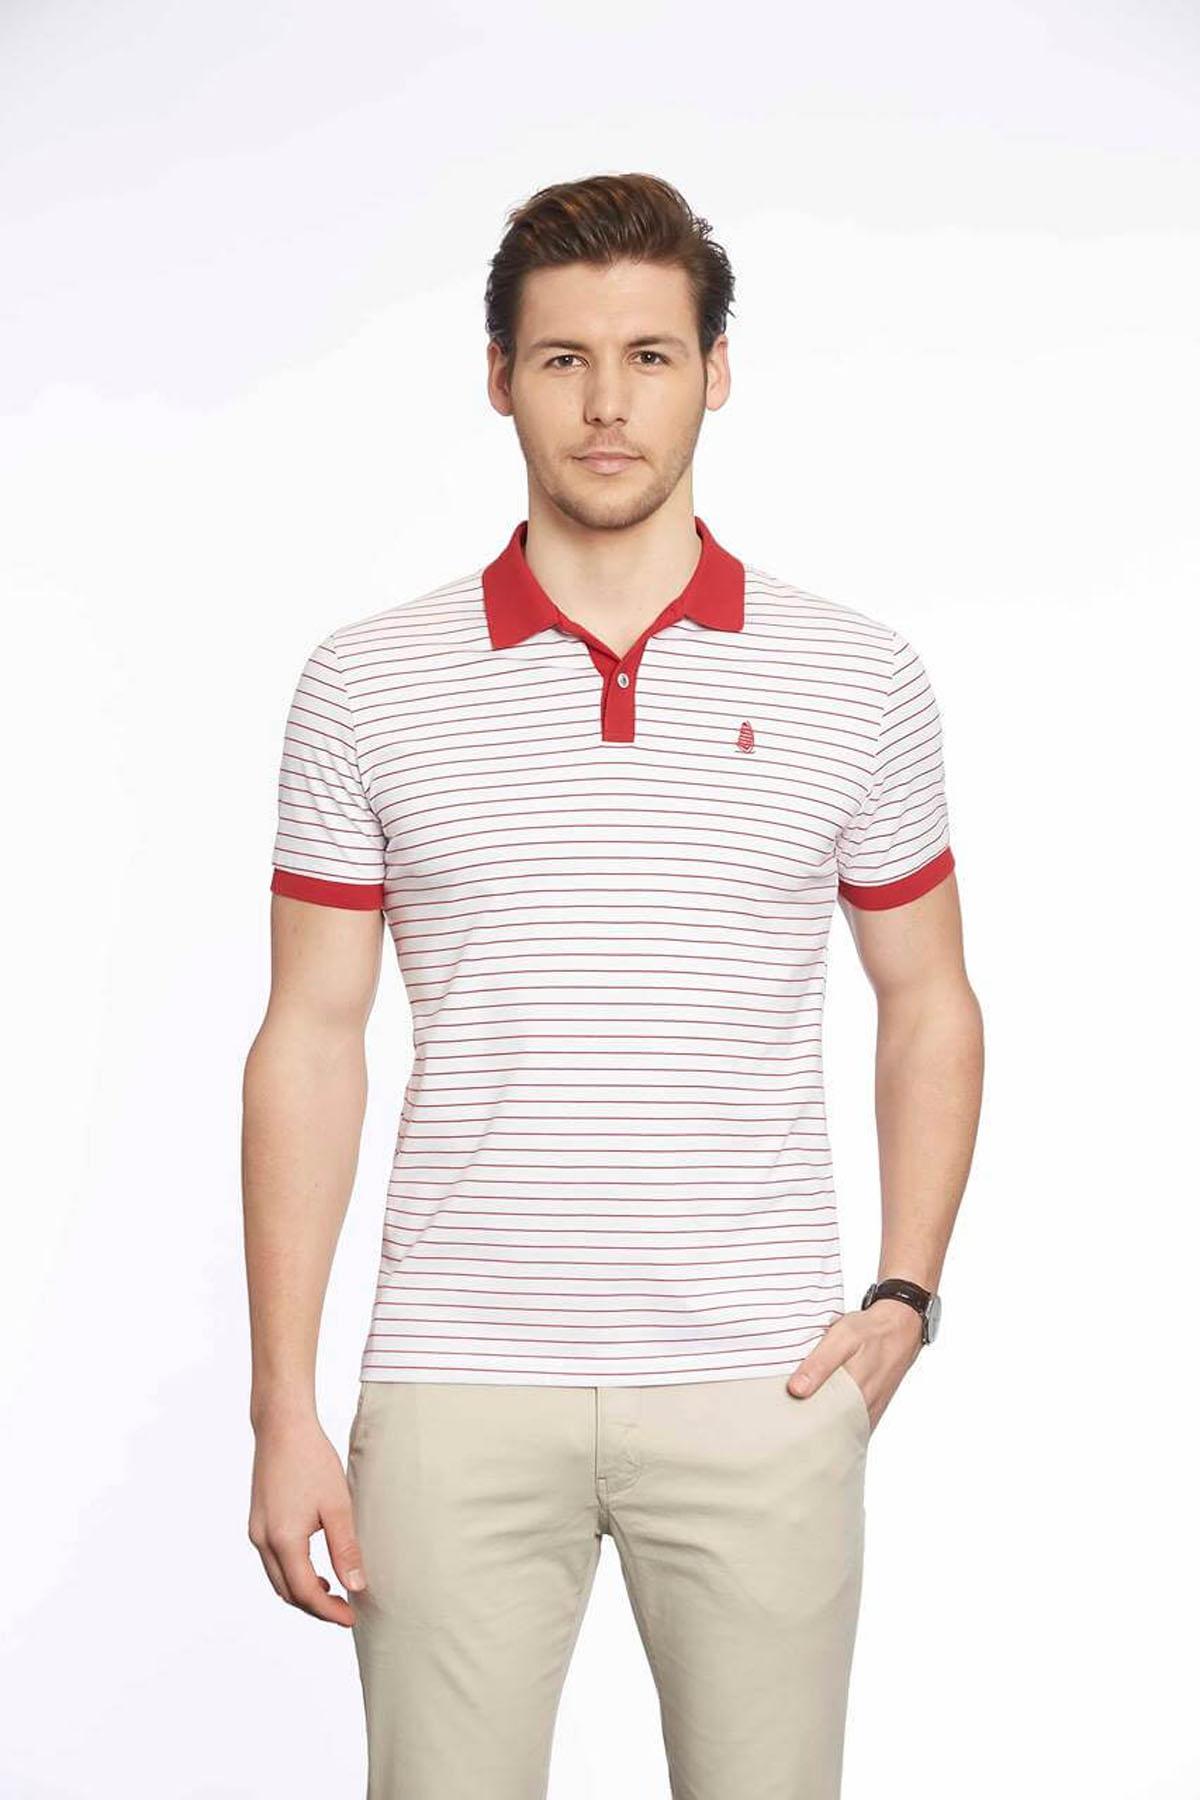 Polo Yaka Erkek T-Shirt Beyaz Kırmızı